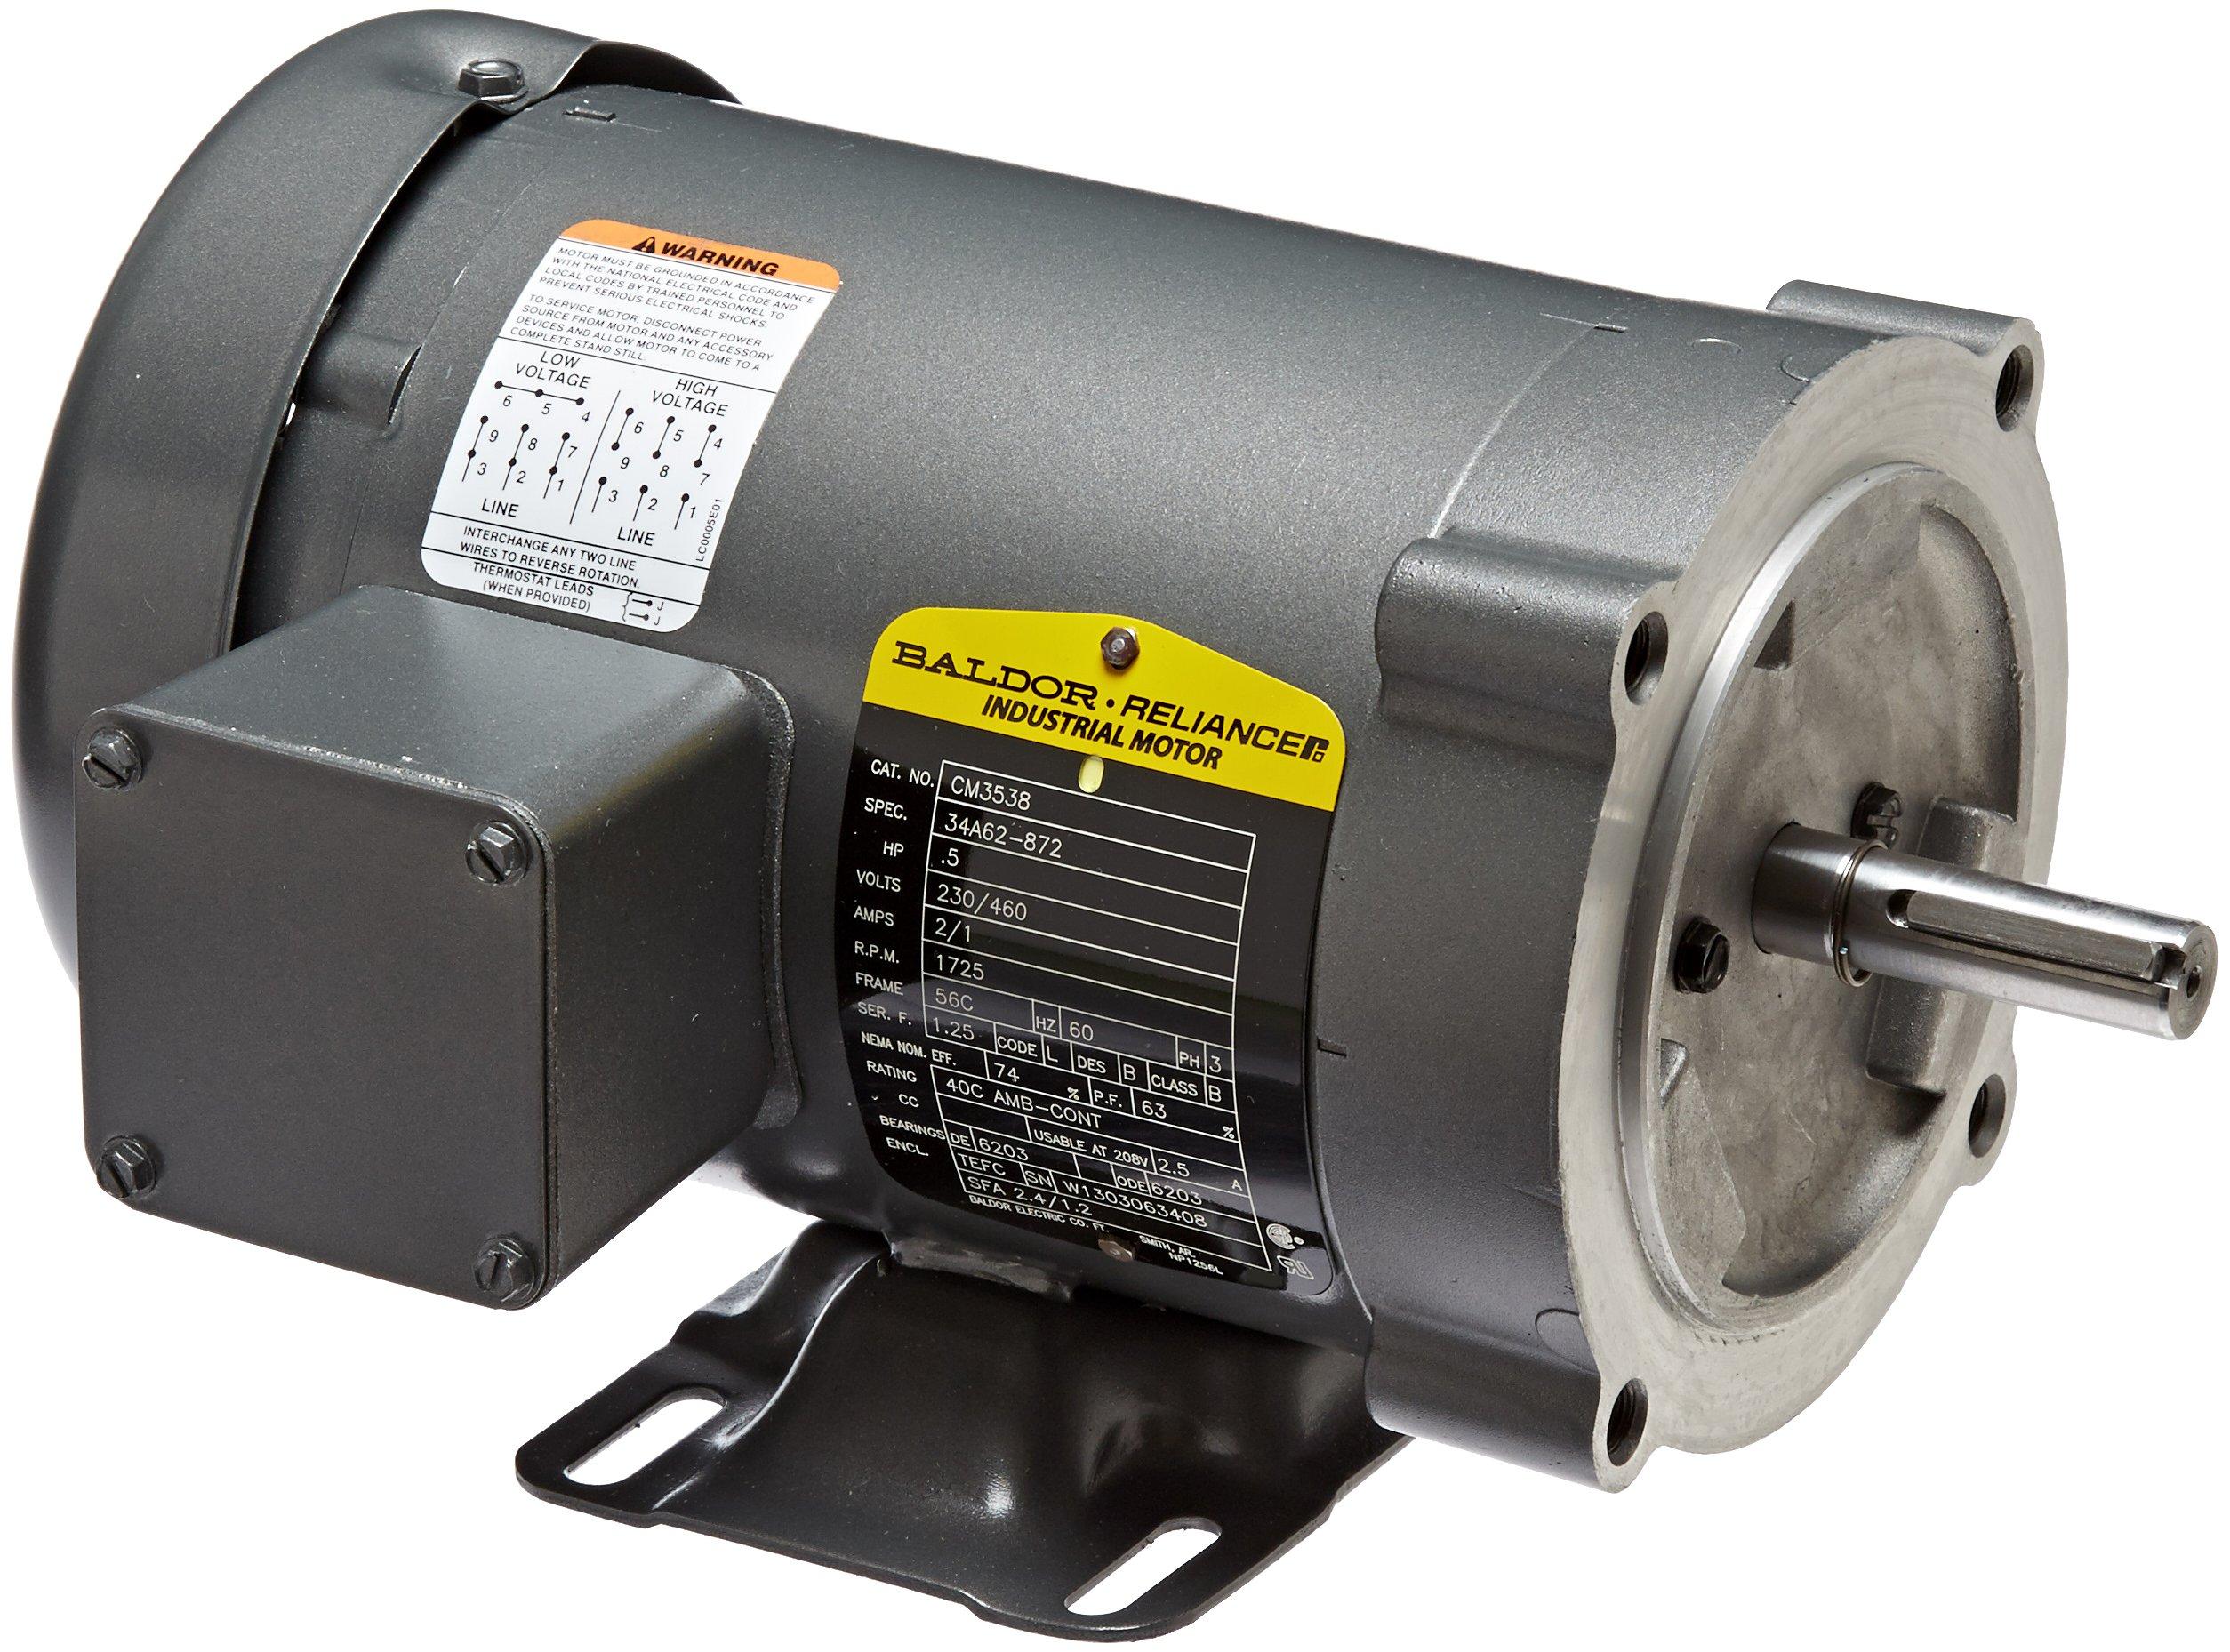 Baldor CM3538 General Purpose AC Motor, 3 Phase, 56C Frame, TEFC Enclosure, 1/2Hp Output, 1725rpm, 60Hz, 230/460V Voltage by Baldor (Image #1)